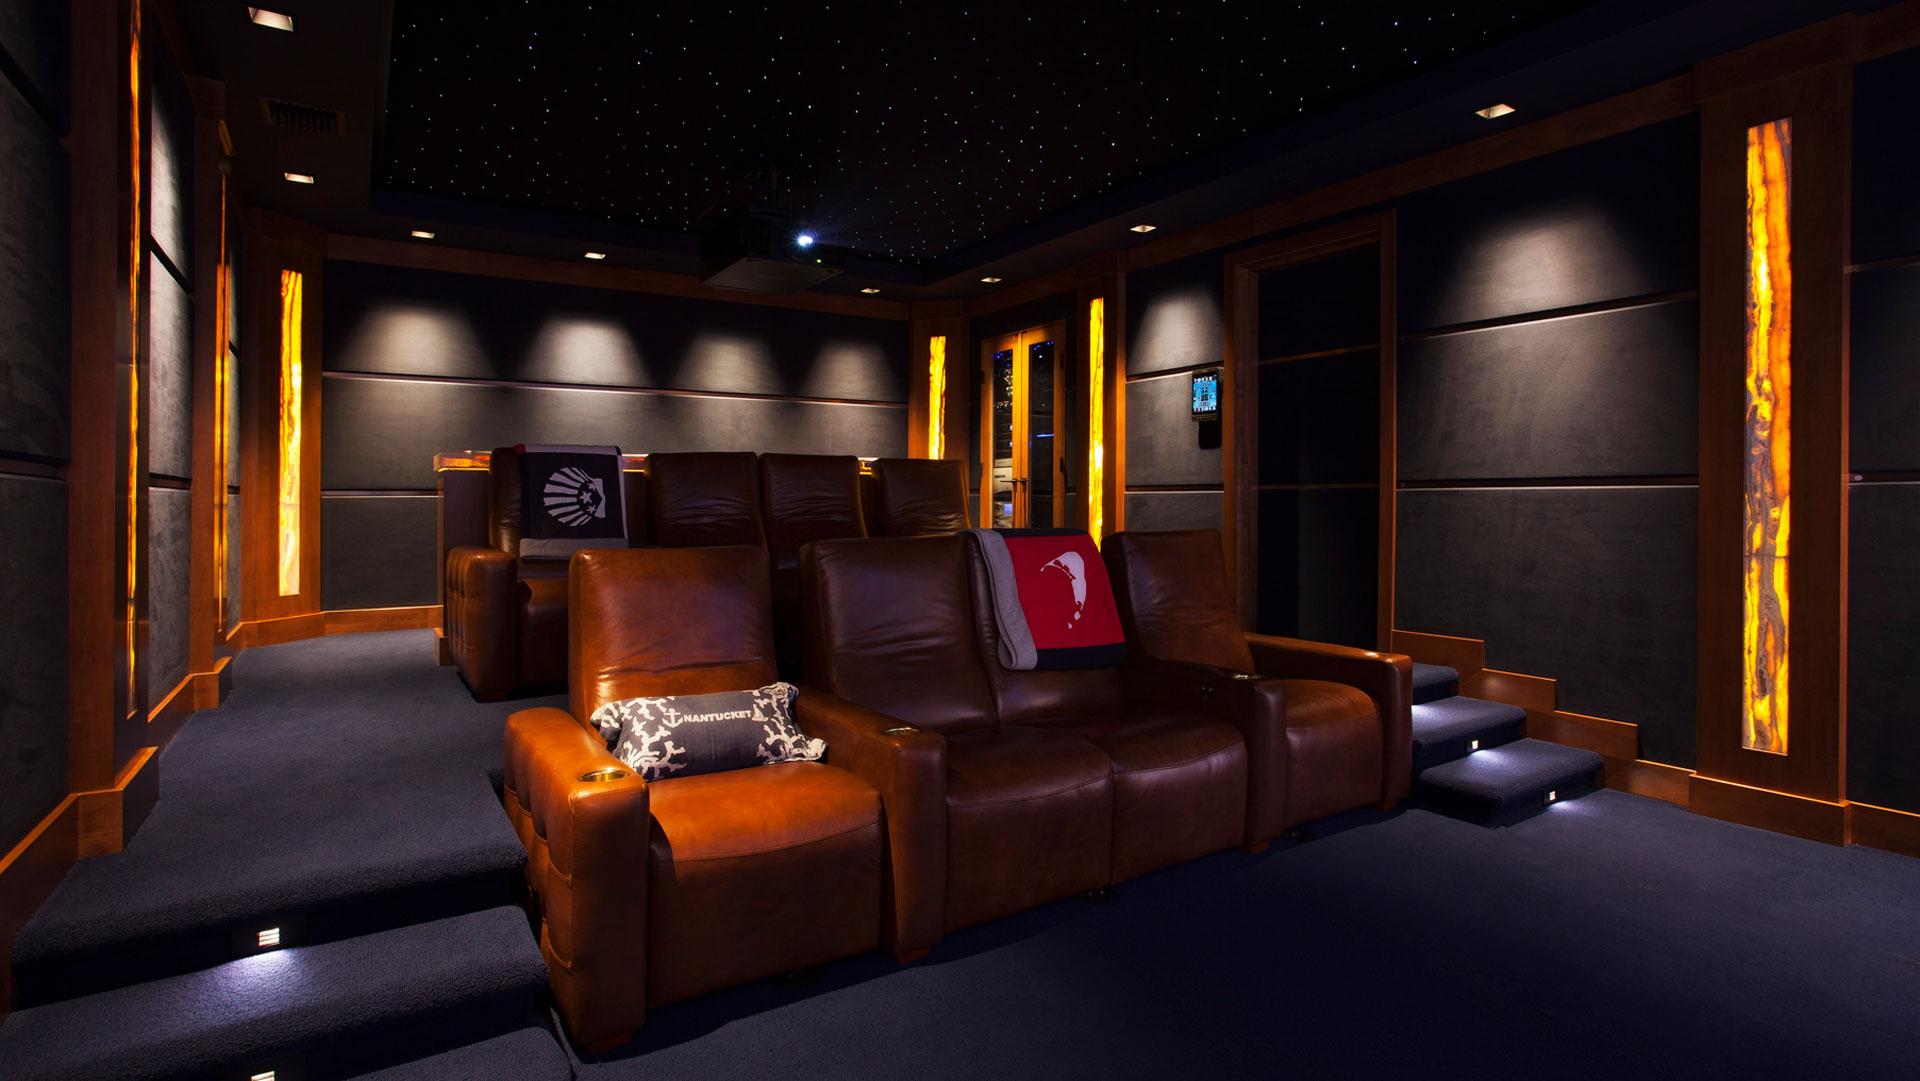 Nantucket Home Theater 7